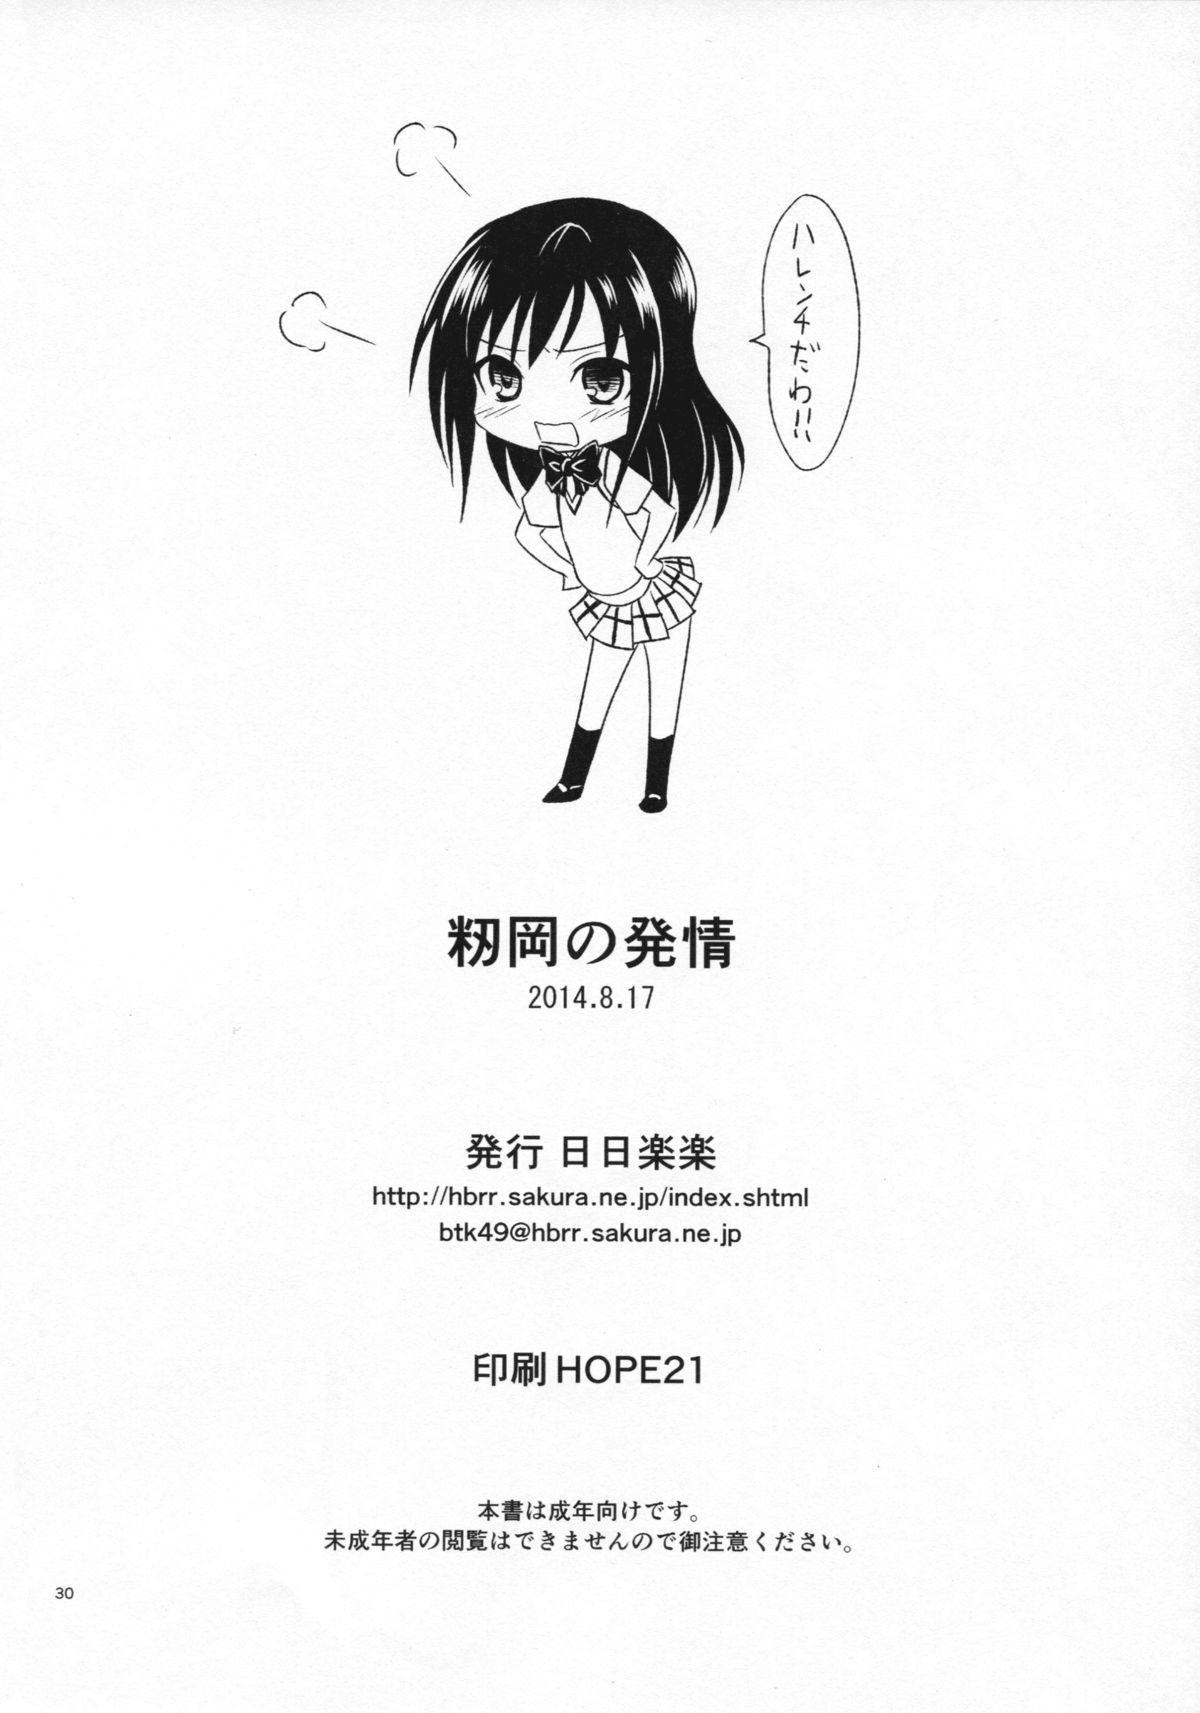 Momioka no Hatsujou | Momioka's Horniness 28